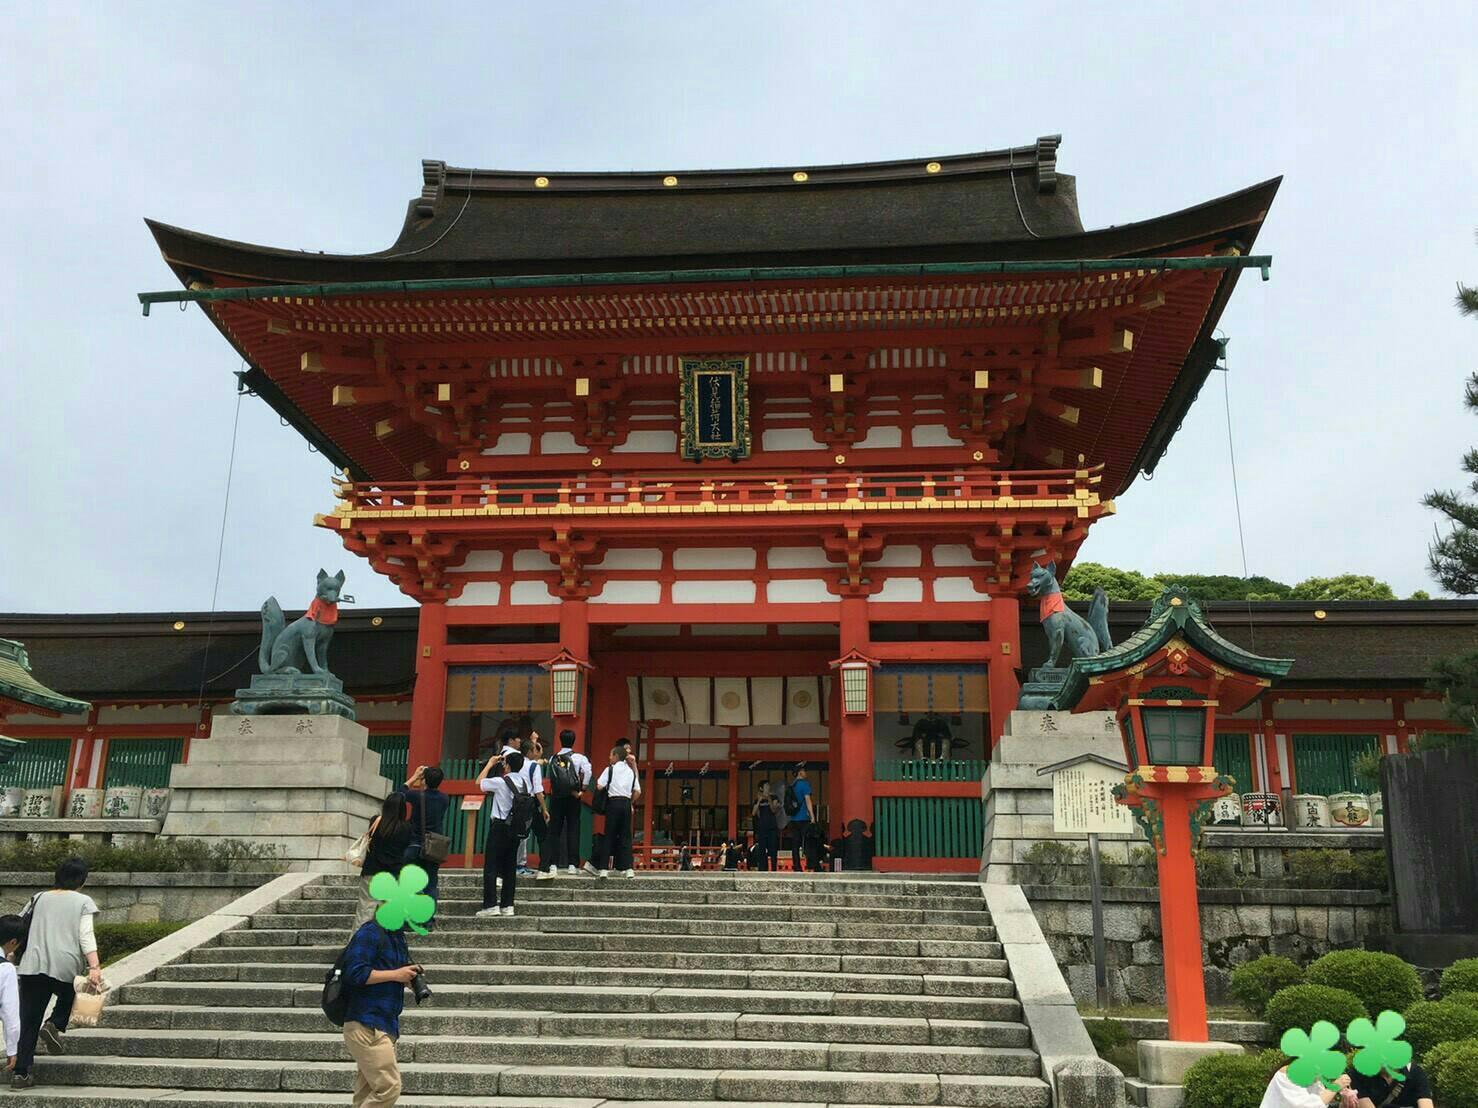 京都の神社 本殿